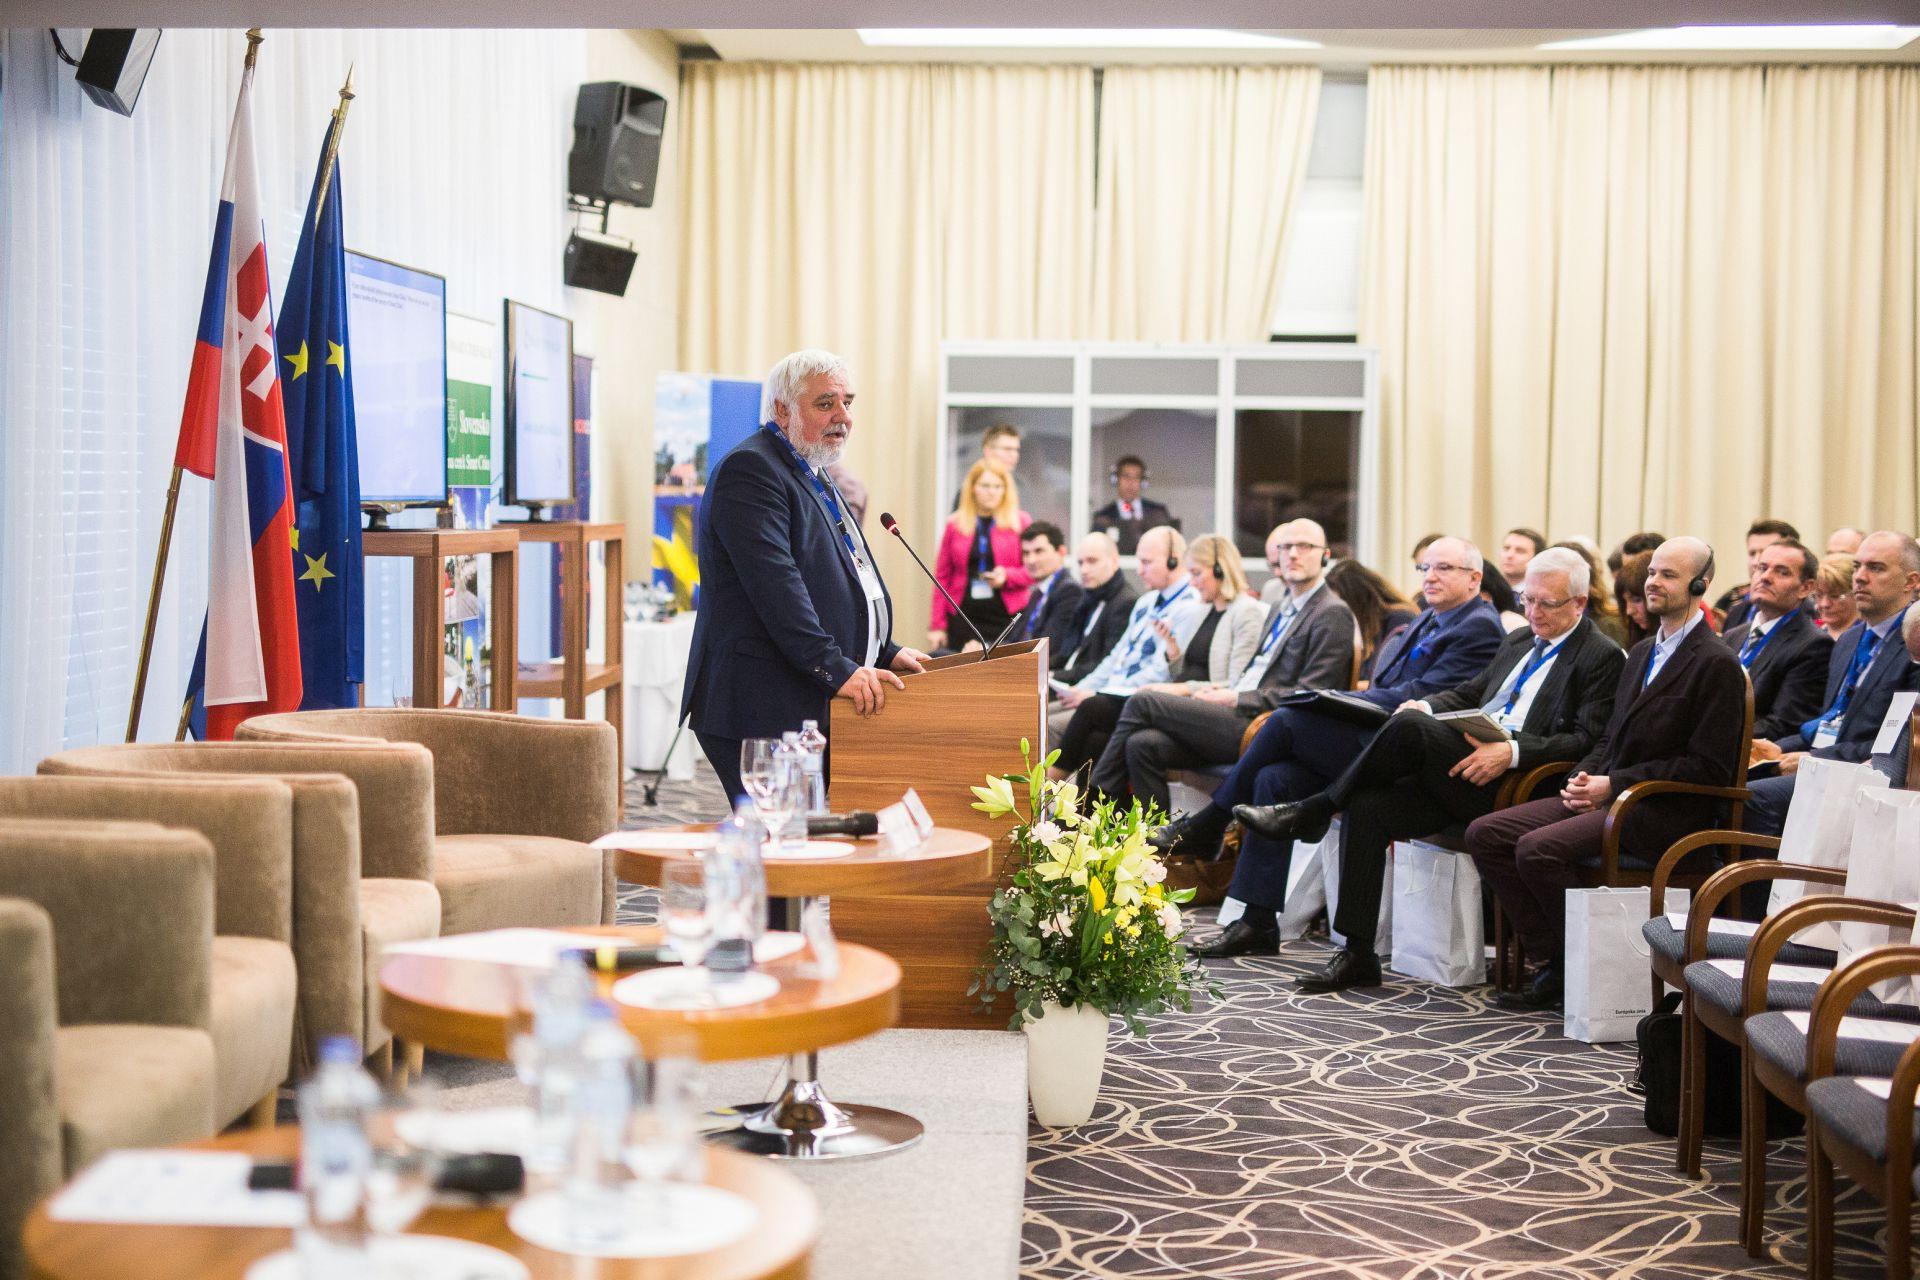 Konferencia Smart Cities, Bratislava, 1. 2. 2018